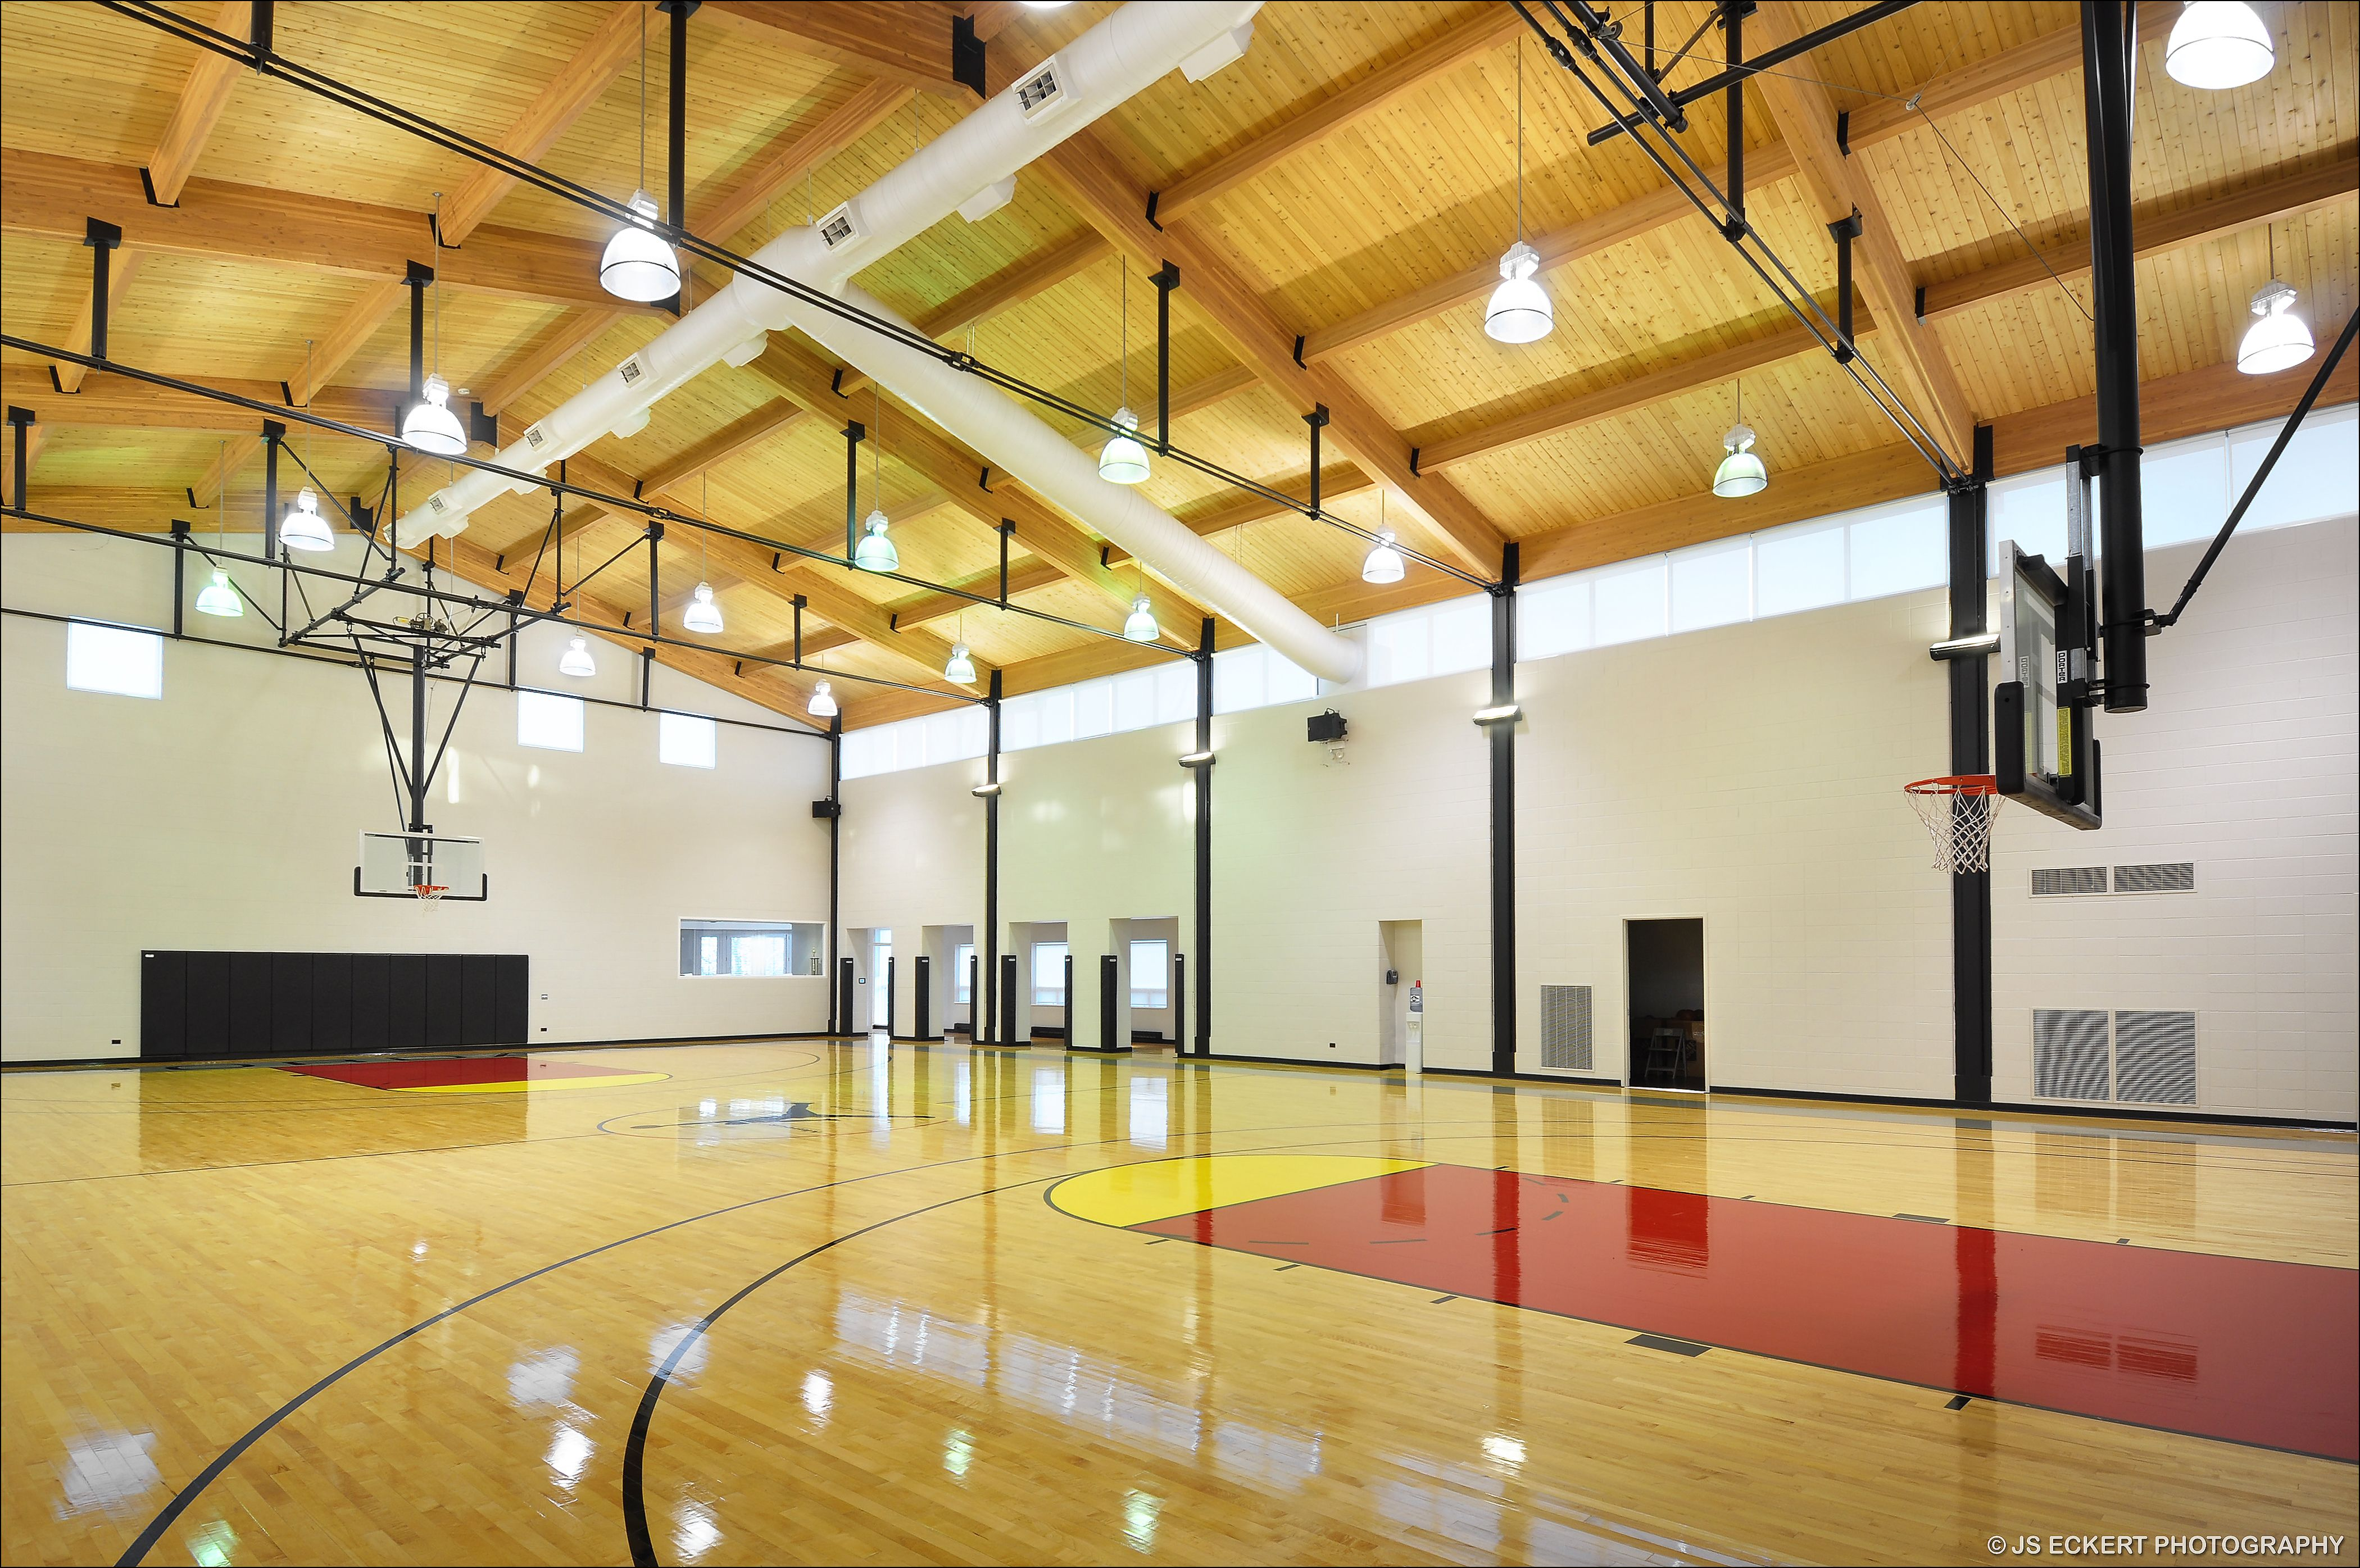 Luxury Homes For Sale Luxury Real Estate Luxury Portfolio Indoor Basketball Court Celebrity Houses Outdoor Basketball Court